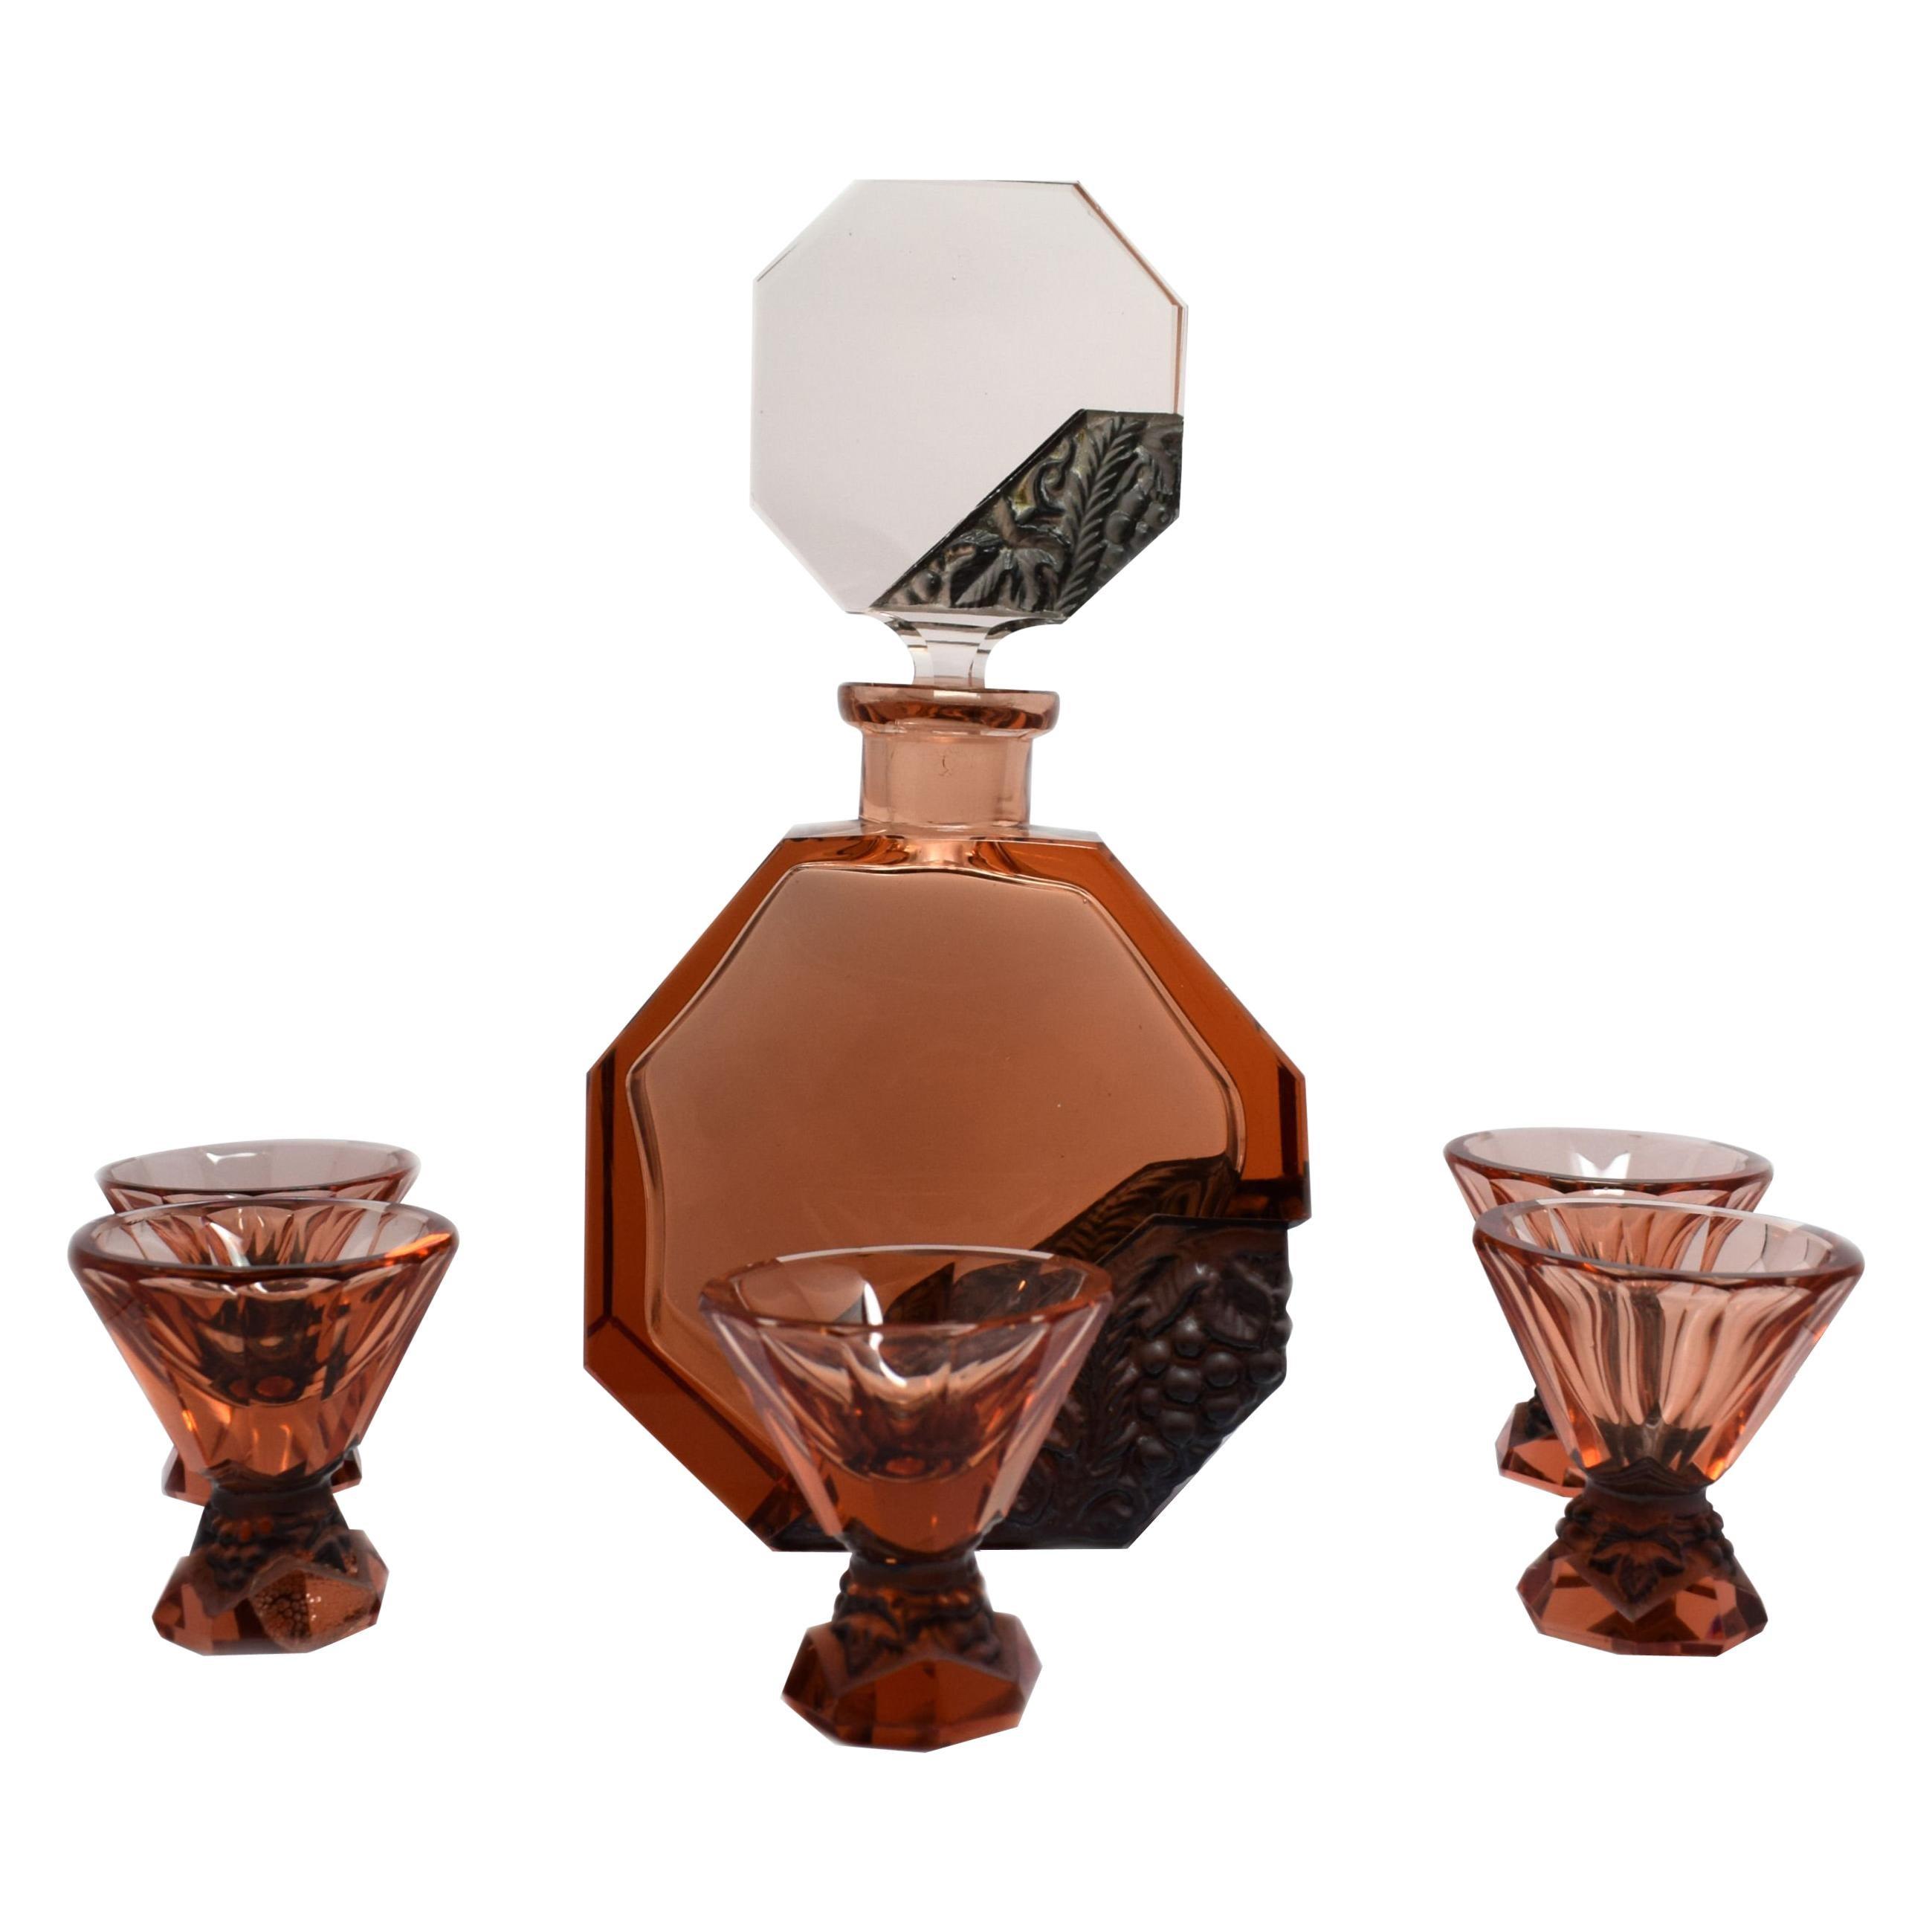 Art Deco Glass Decanter Set by Schlevogt & Hoffman